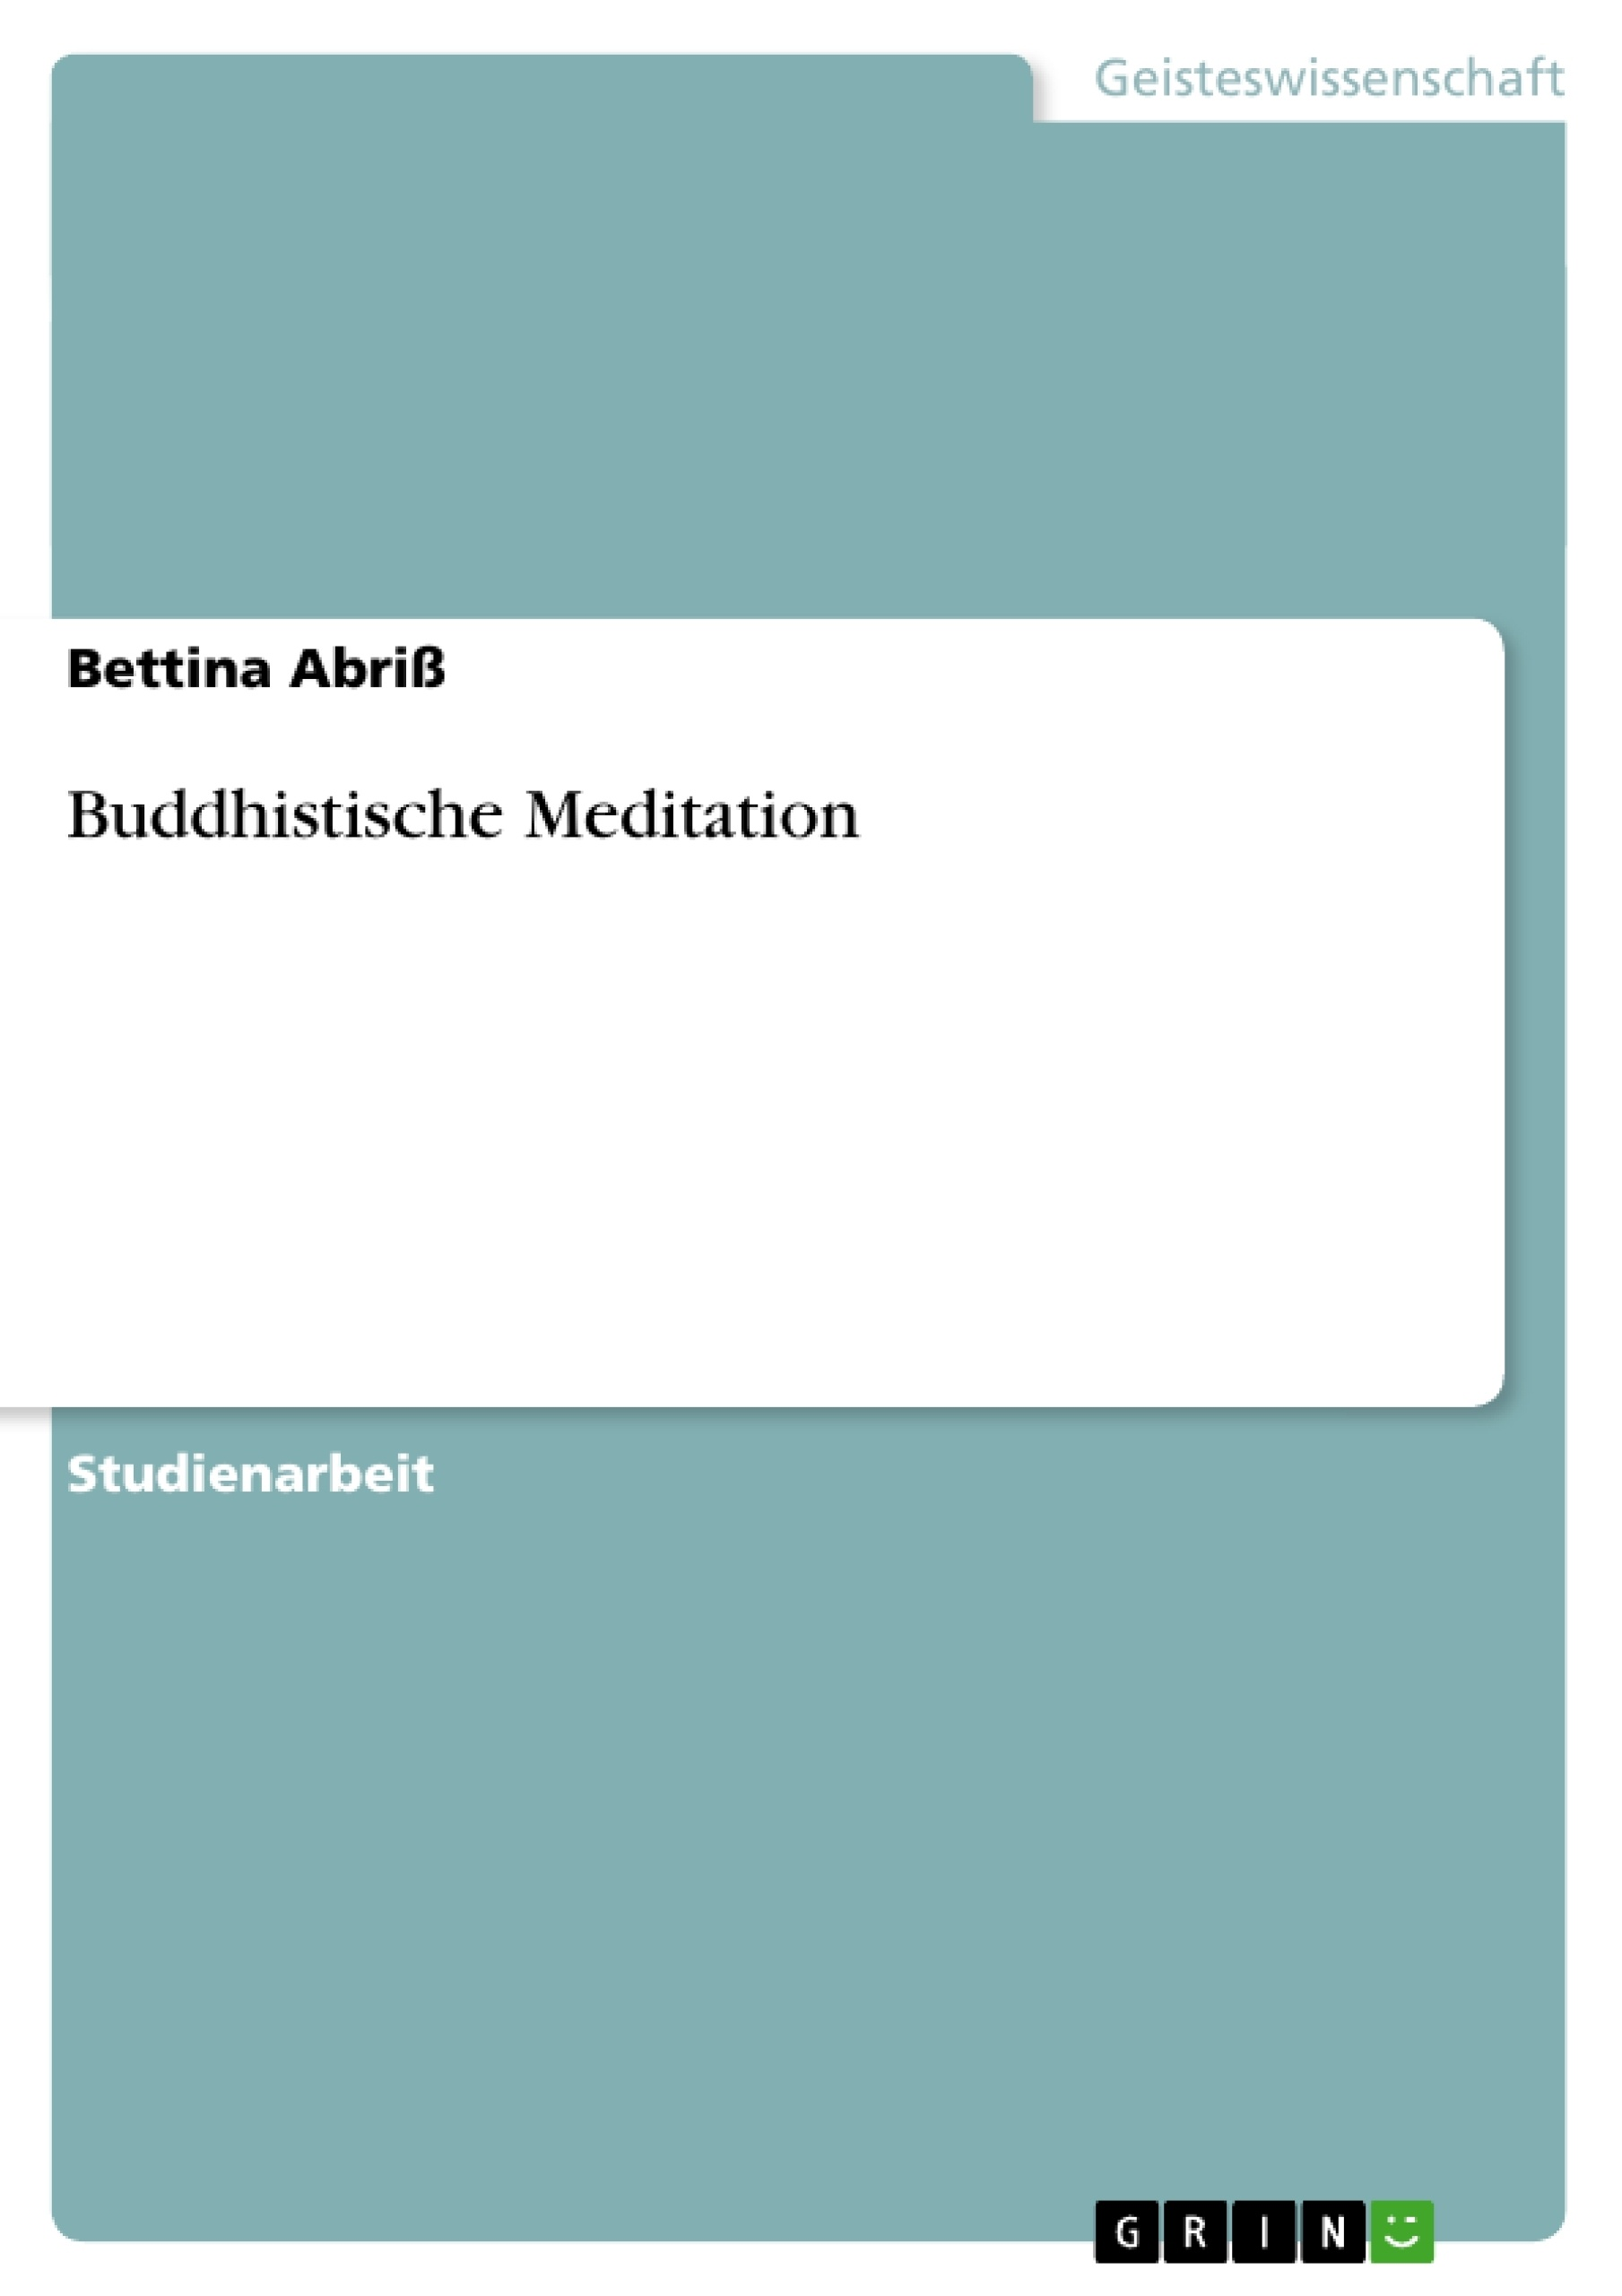 Titel: Buddhistische Meditation